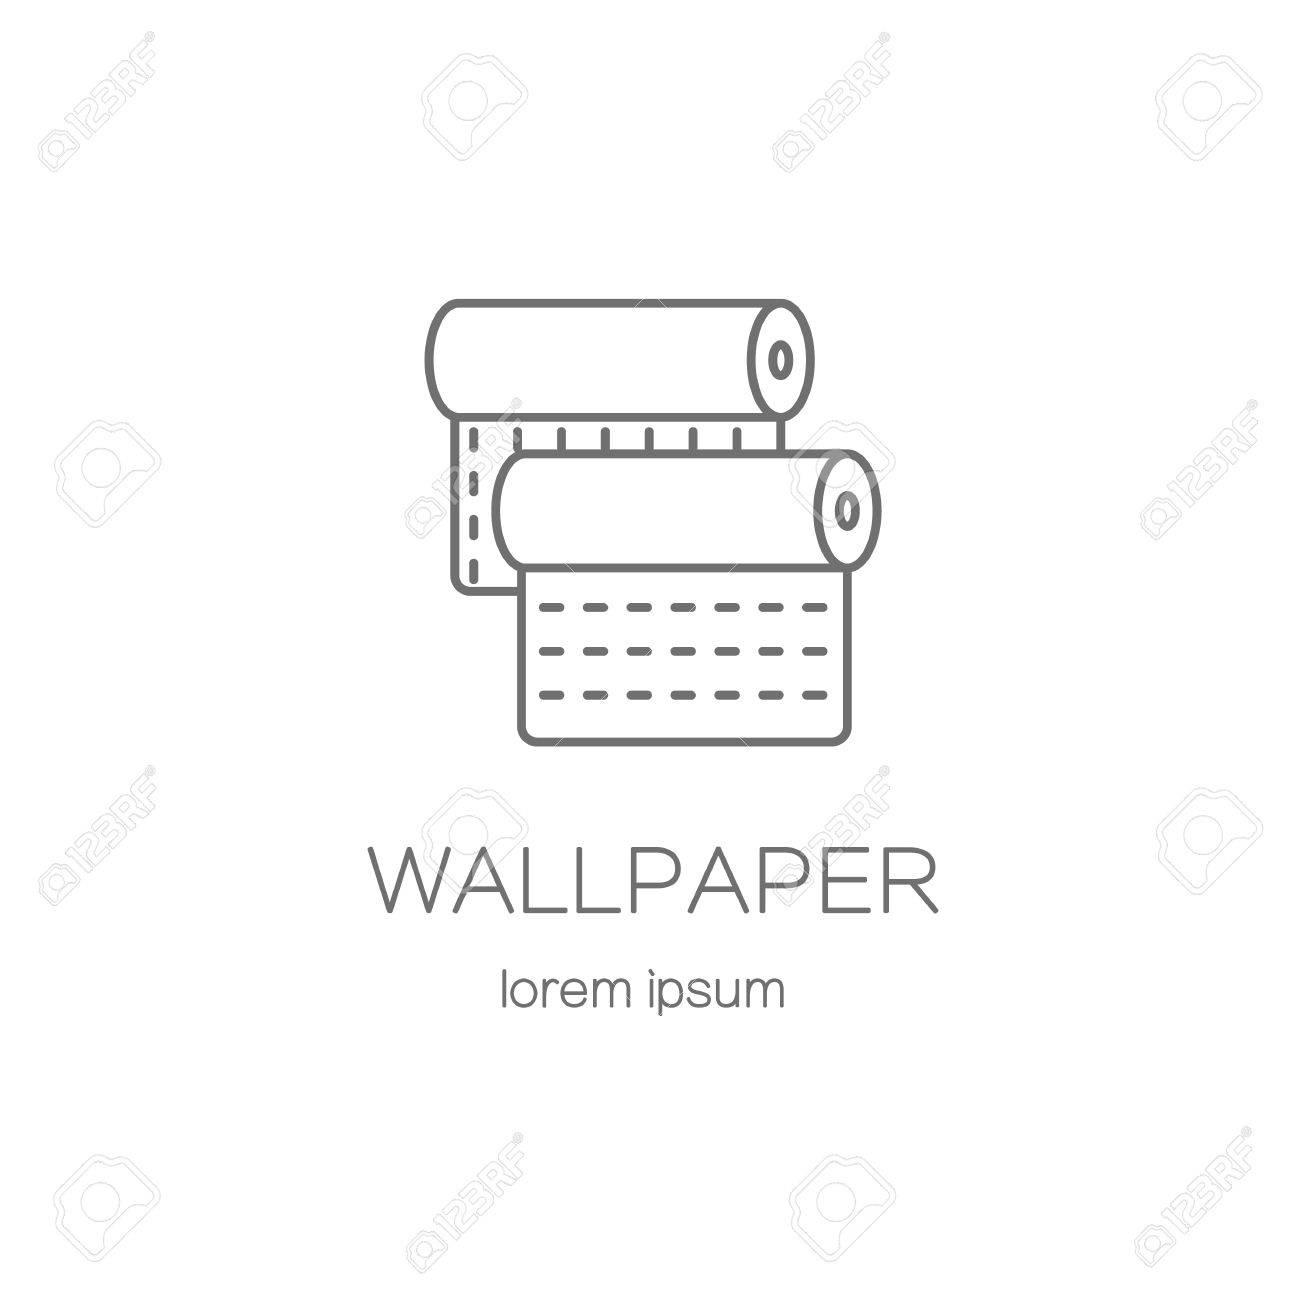 Wallpaper DIY Shop Logotype Design Templates. Modern Easy To ...